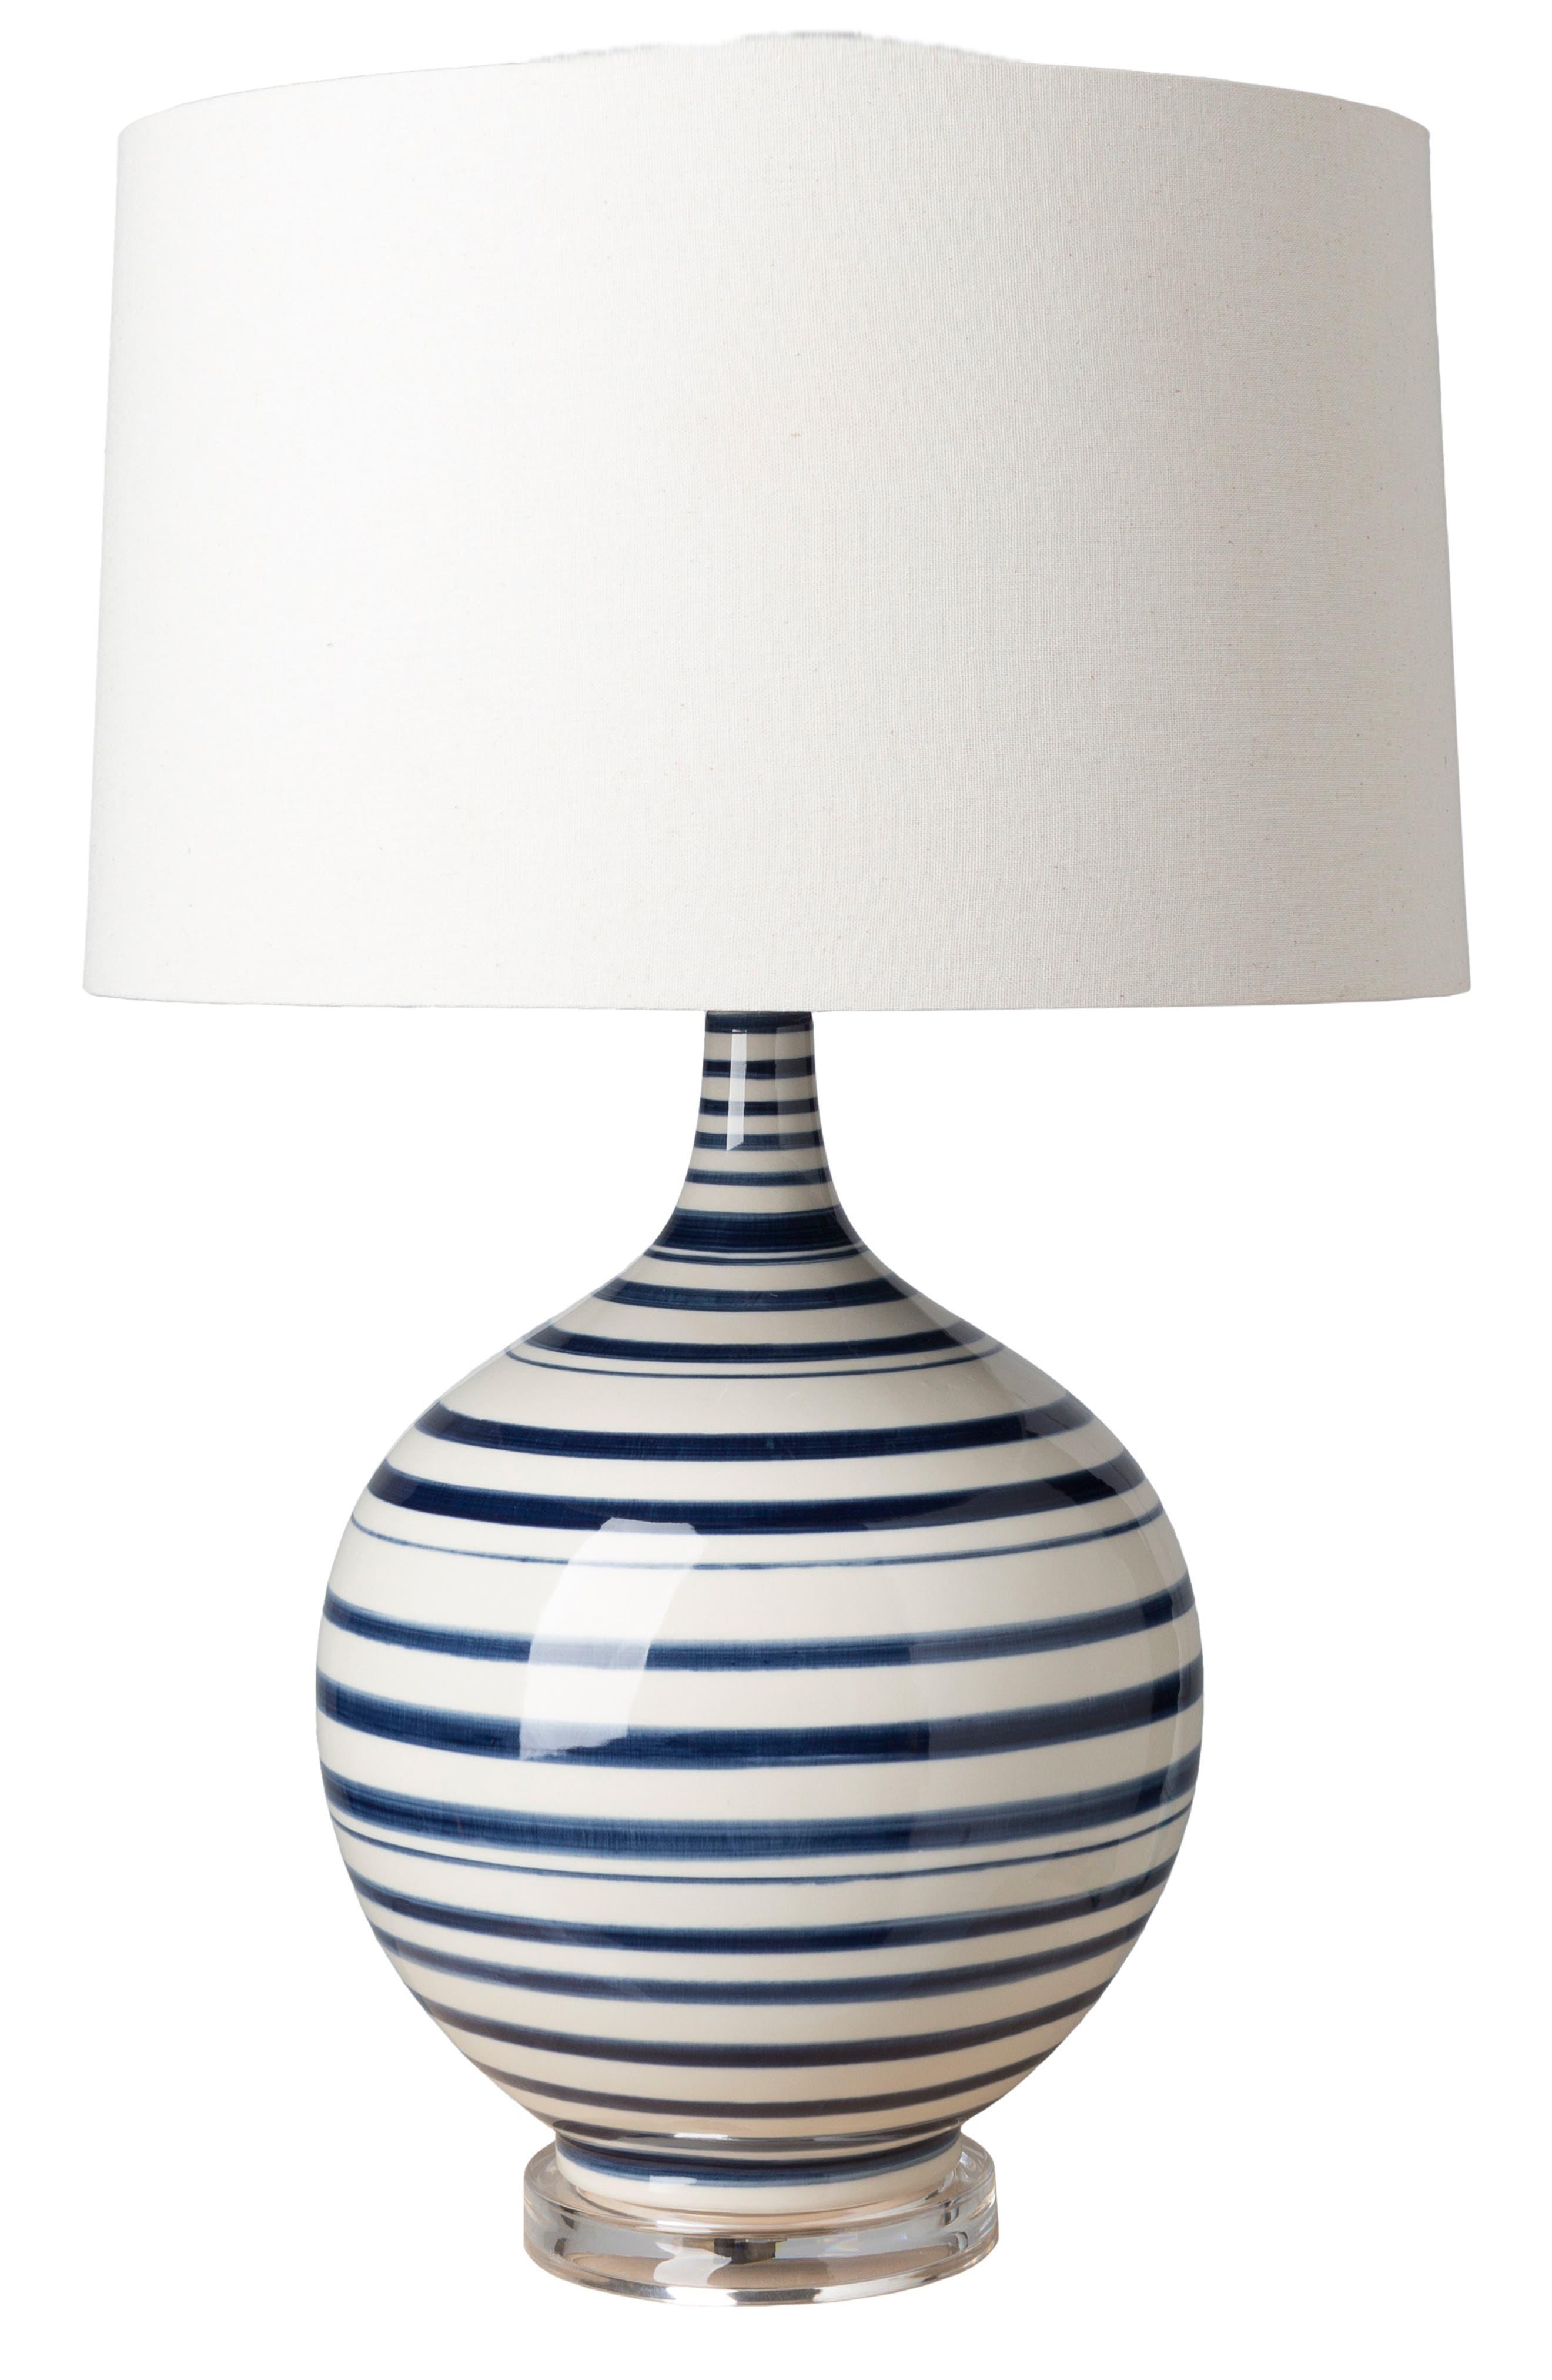 Surya Home Tideline Table Lamp